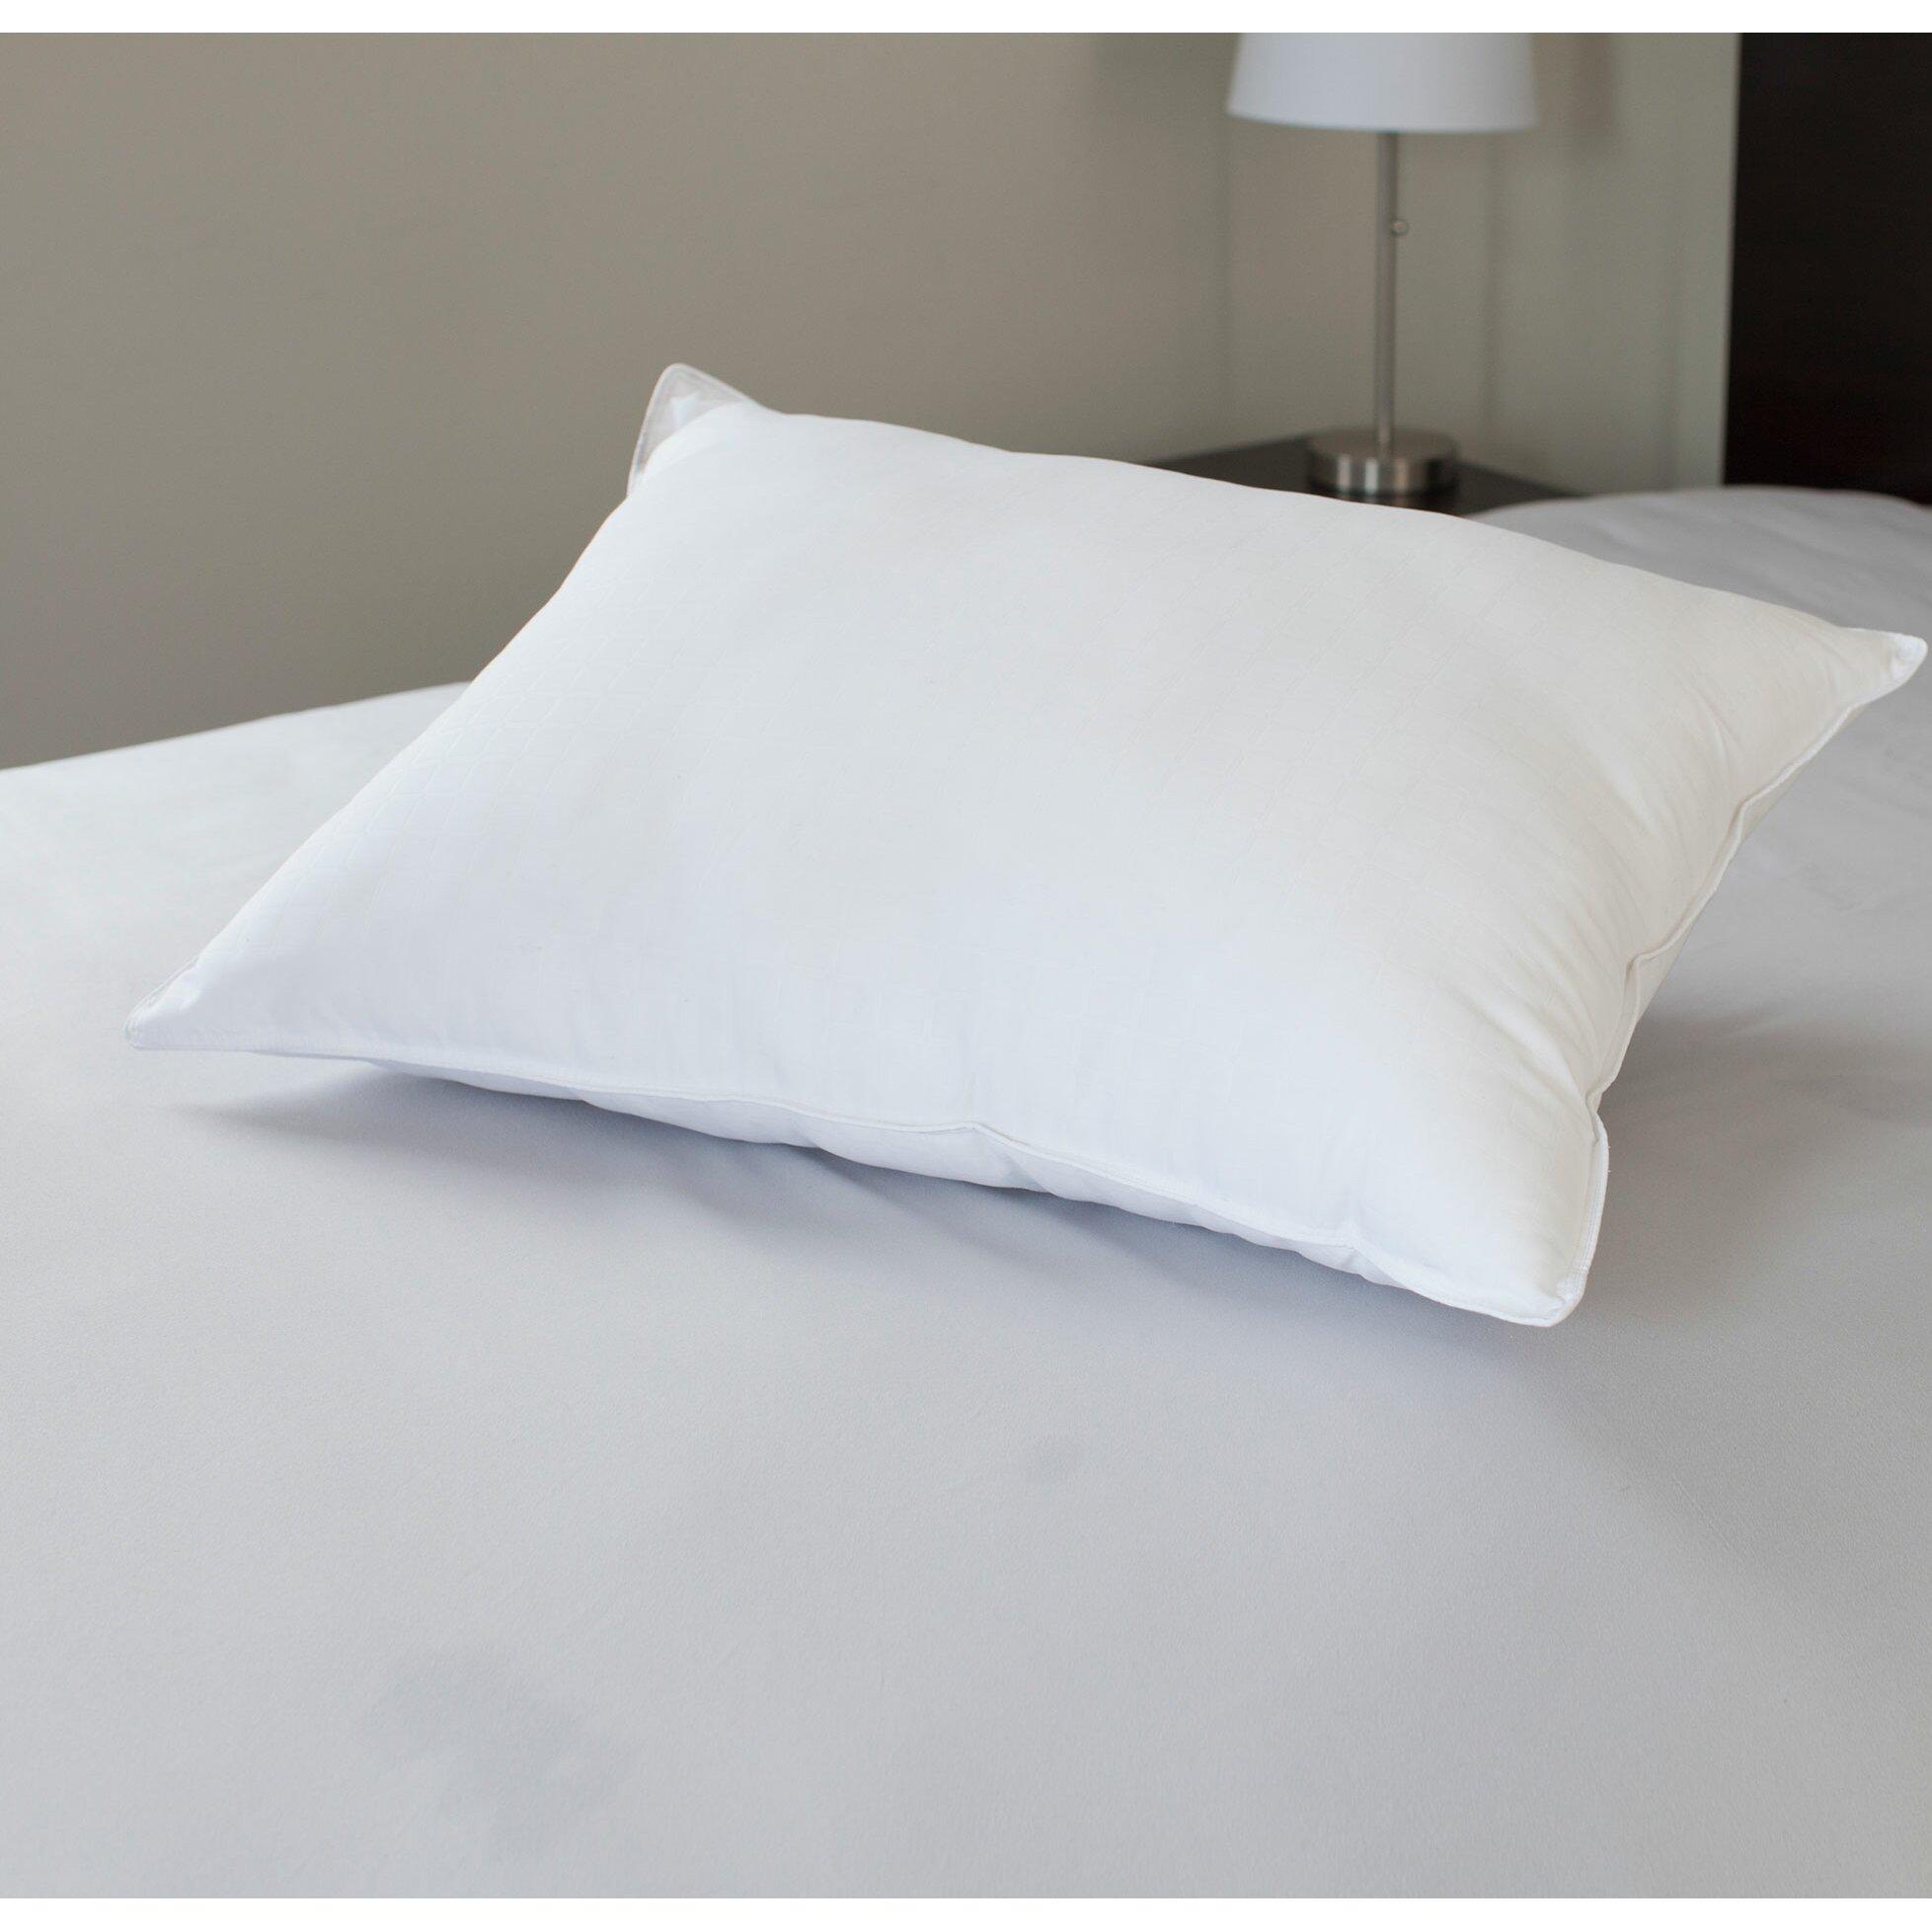 Plyh Down Pillow Reviews Wayfair